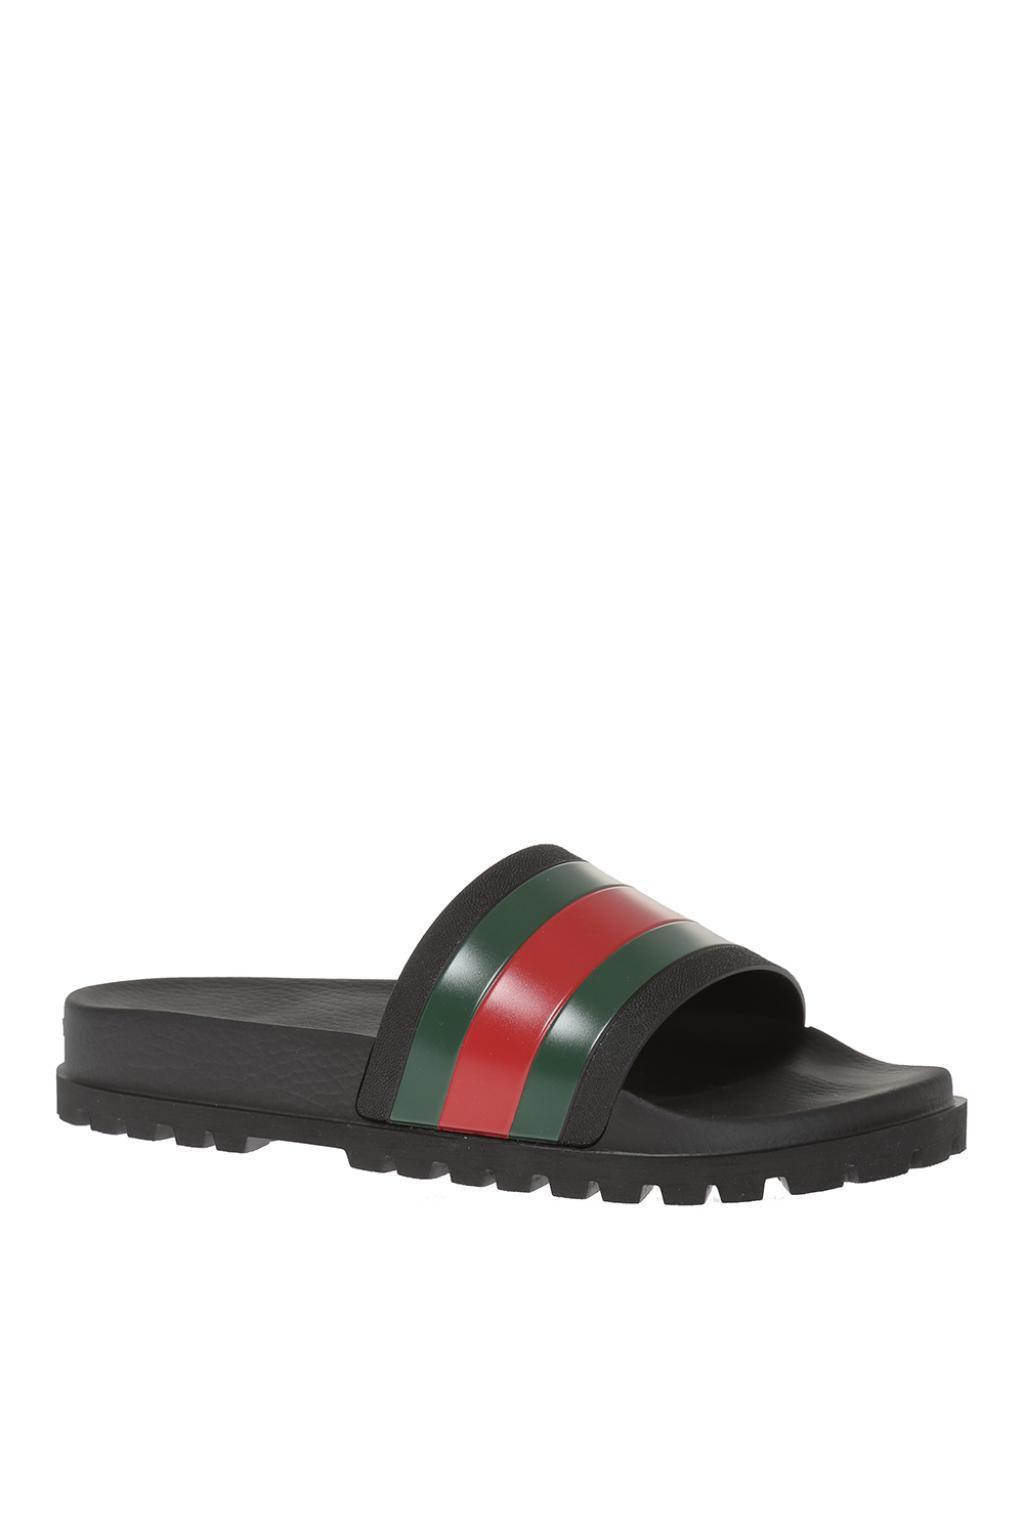 39b1e23504db8c Lyst - Gucci Striped Web Rubber Slides in Black for Men - Save 30%